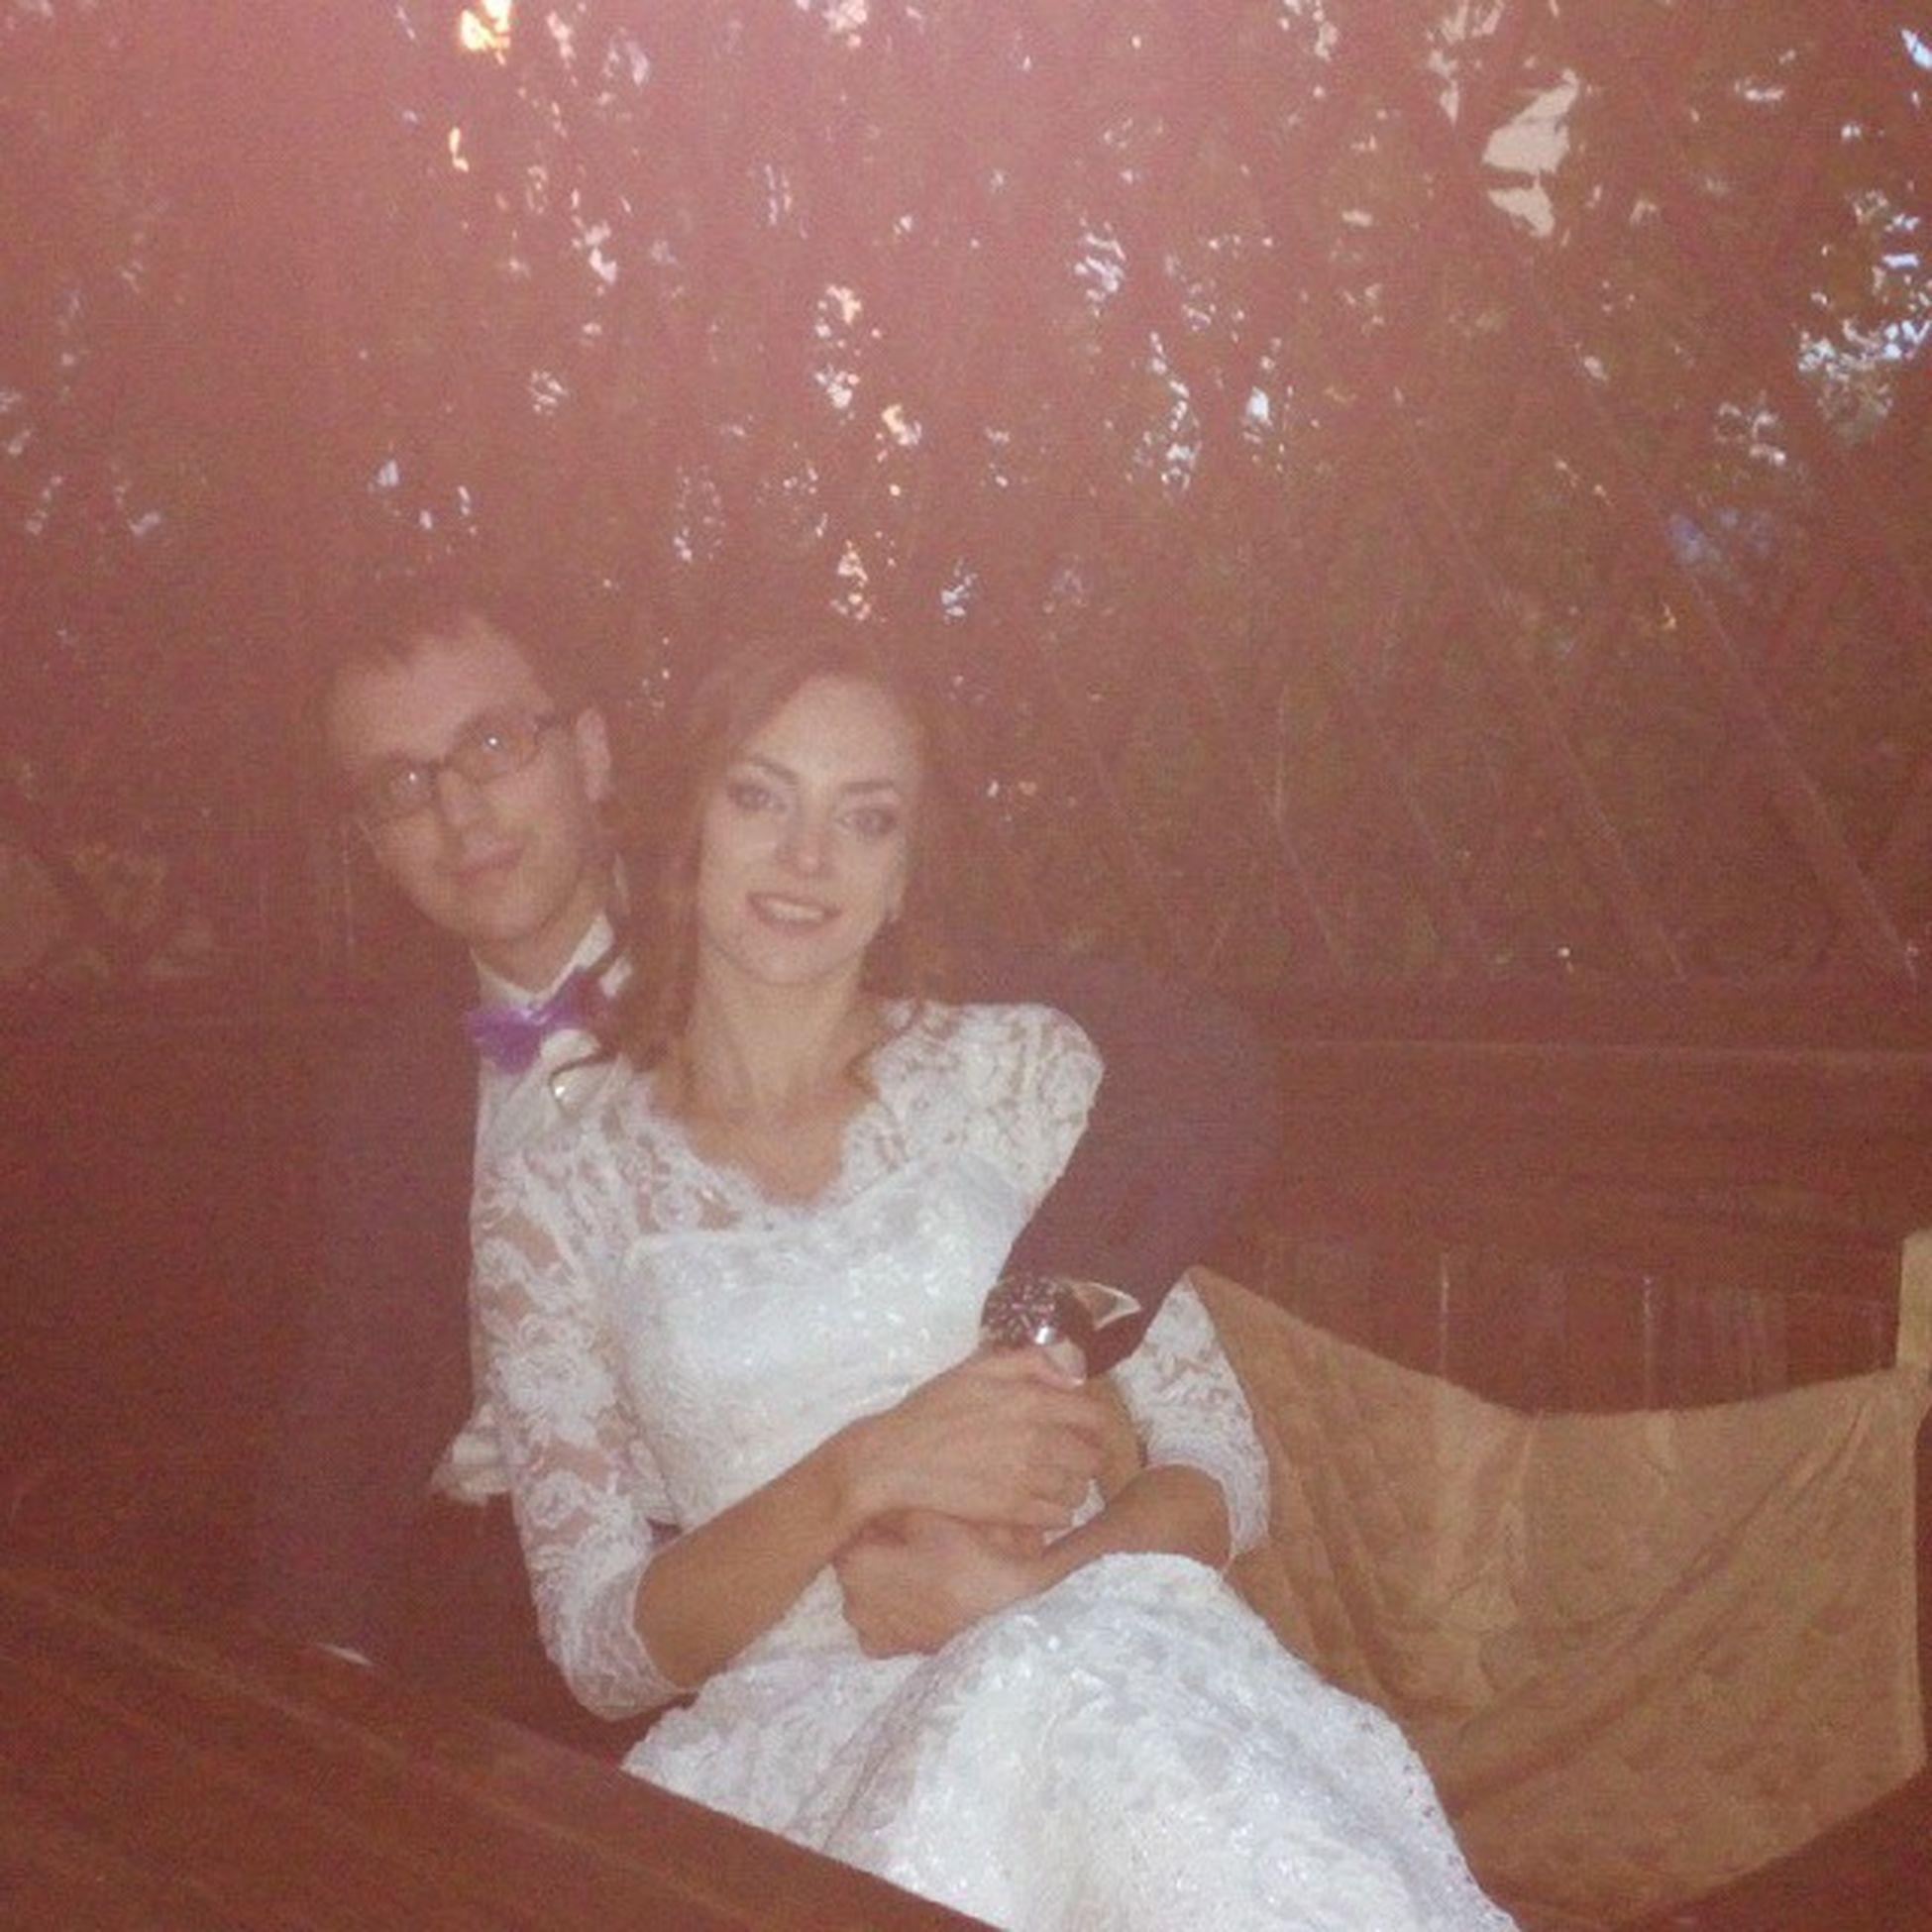 Vintage La_romantic Wedding_day Love new_family passion mr_mrs